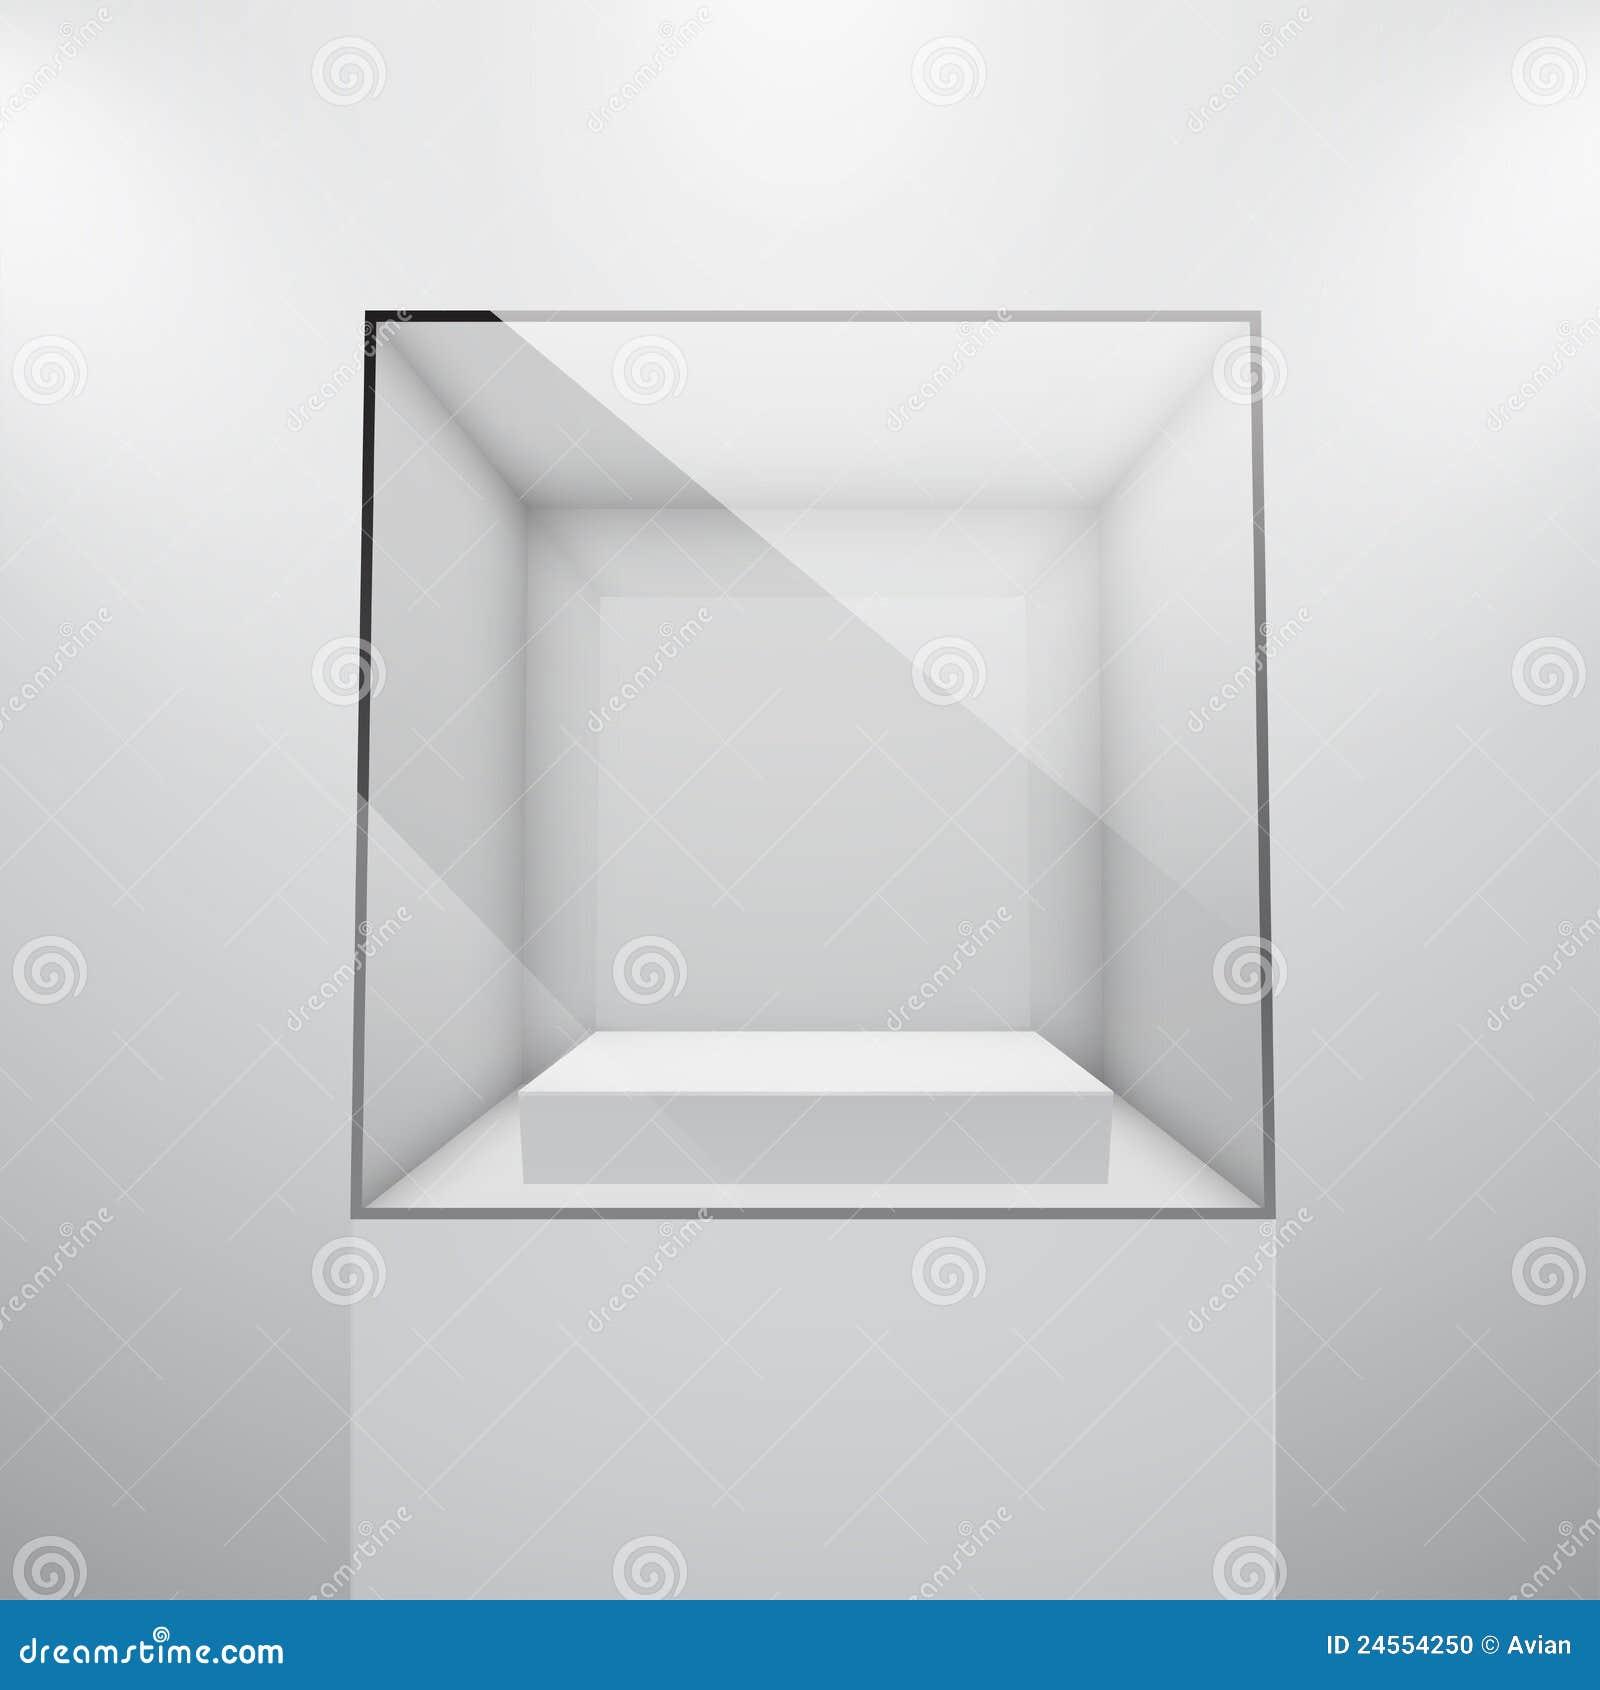 Exhibition D Vector : Empty glass showcase for exhibit d vector